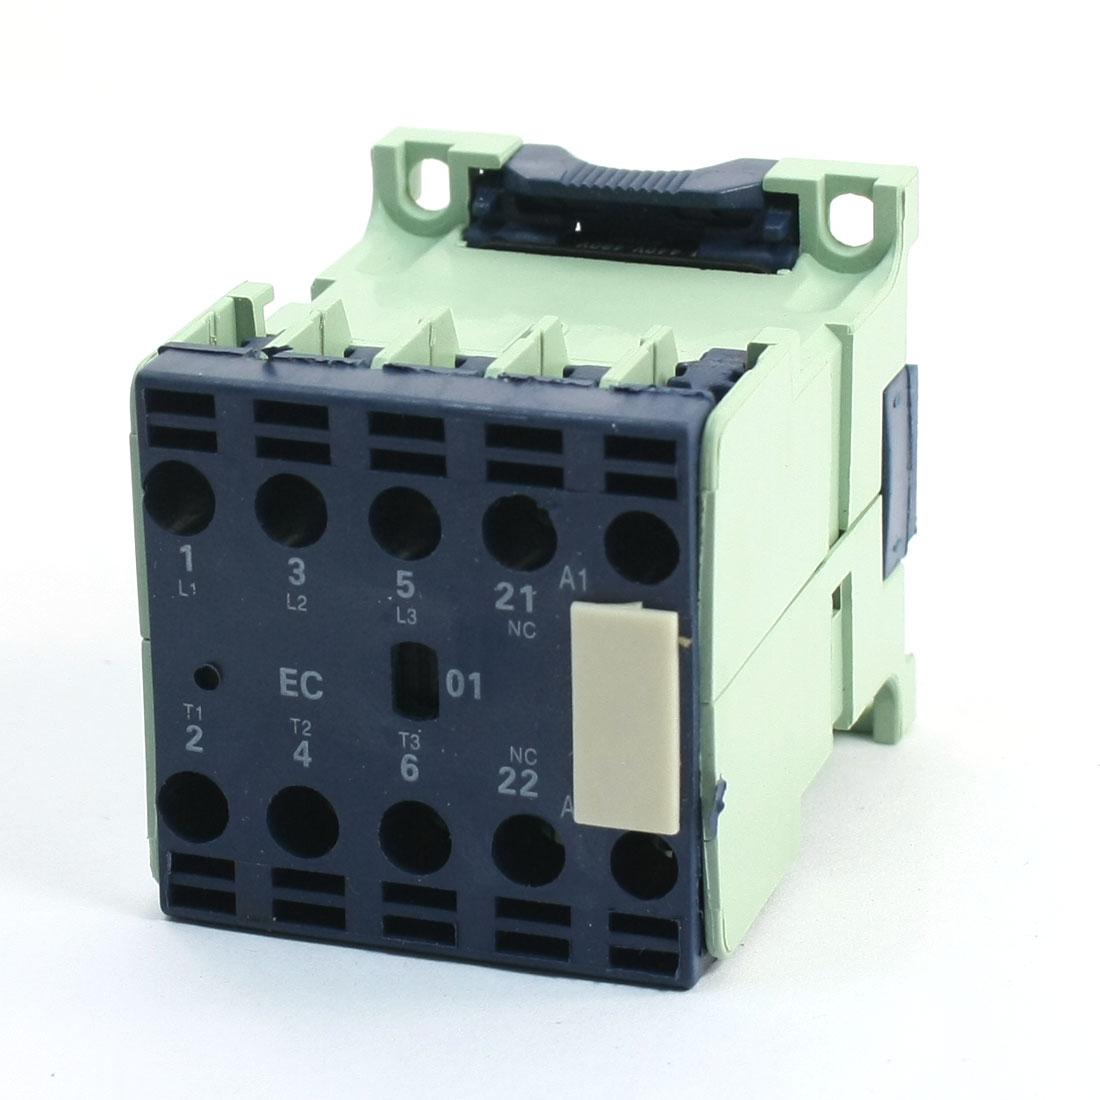 CJX2-0901E 3 Pole 1NC Motor Control AC Contactor Coil Voltage 380-415V